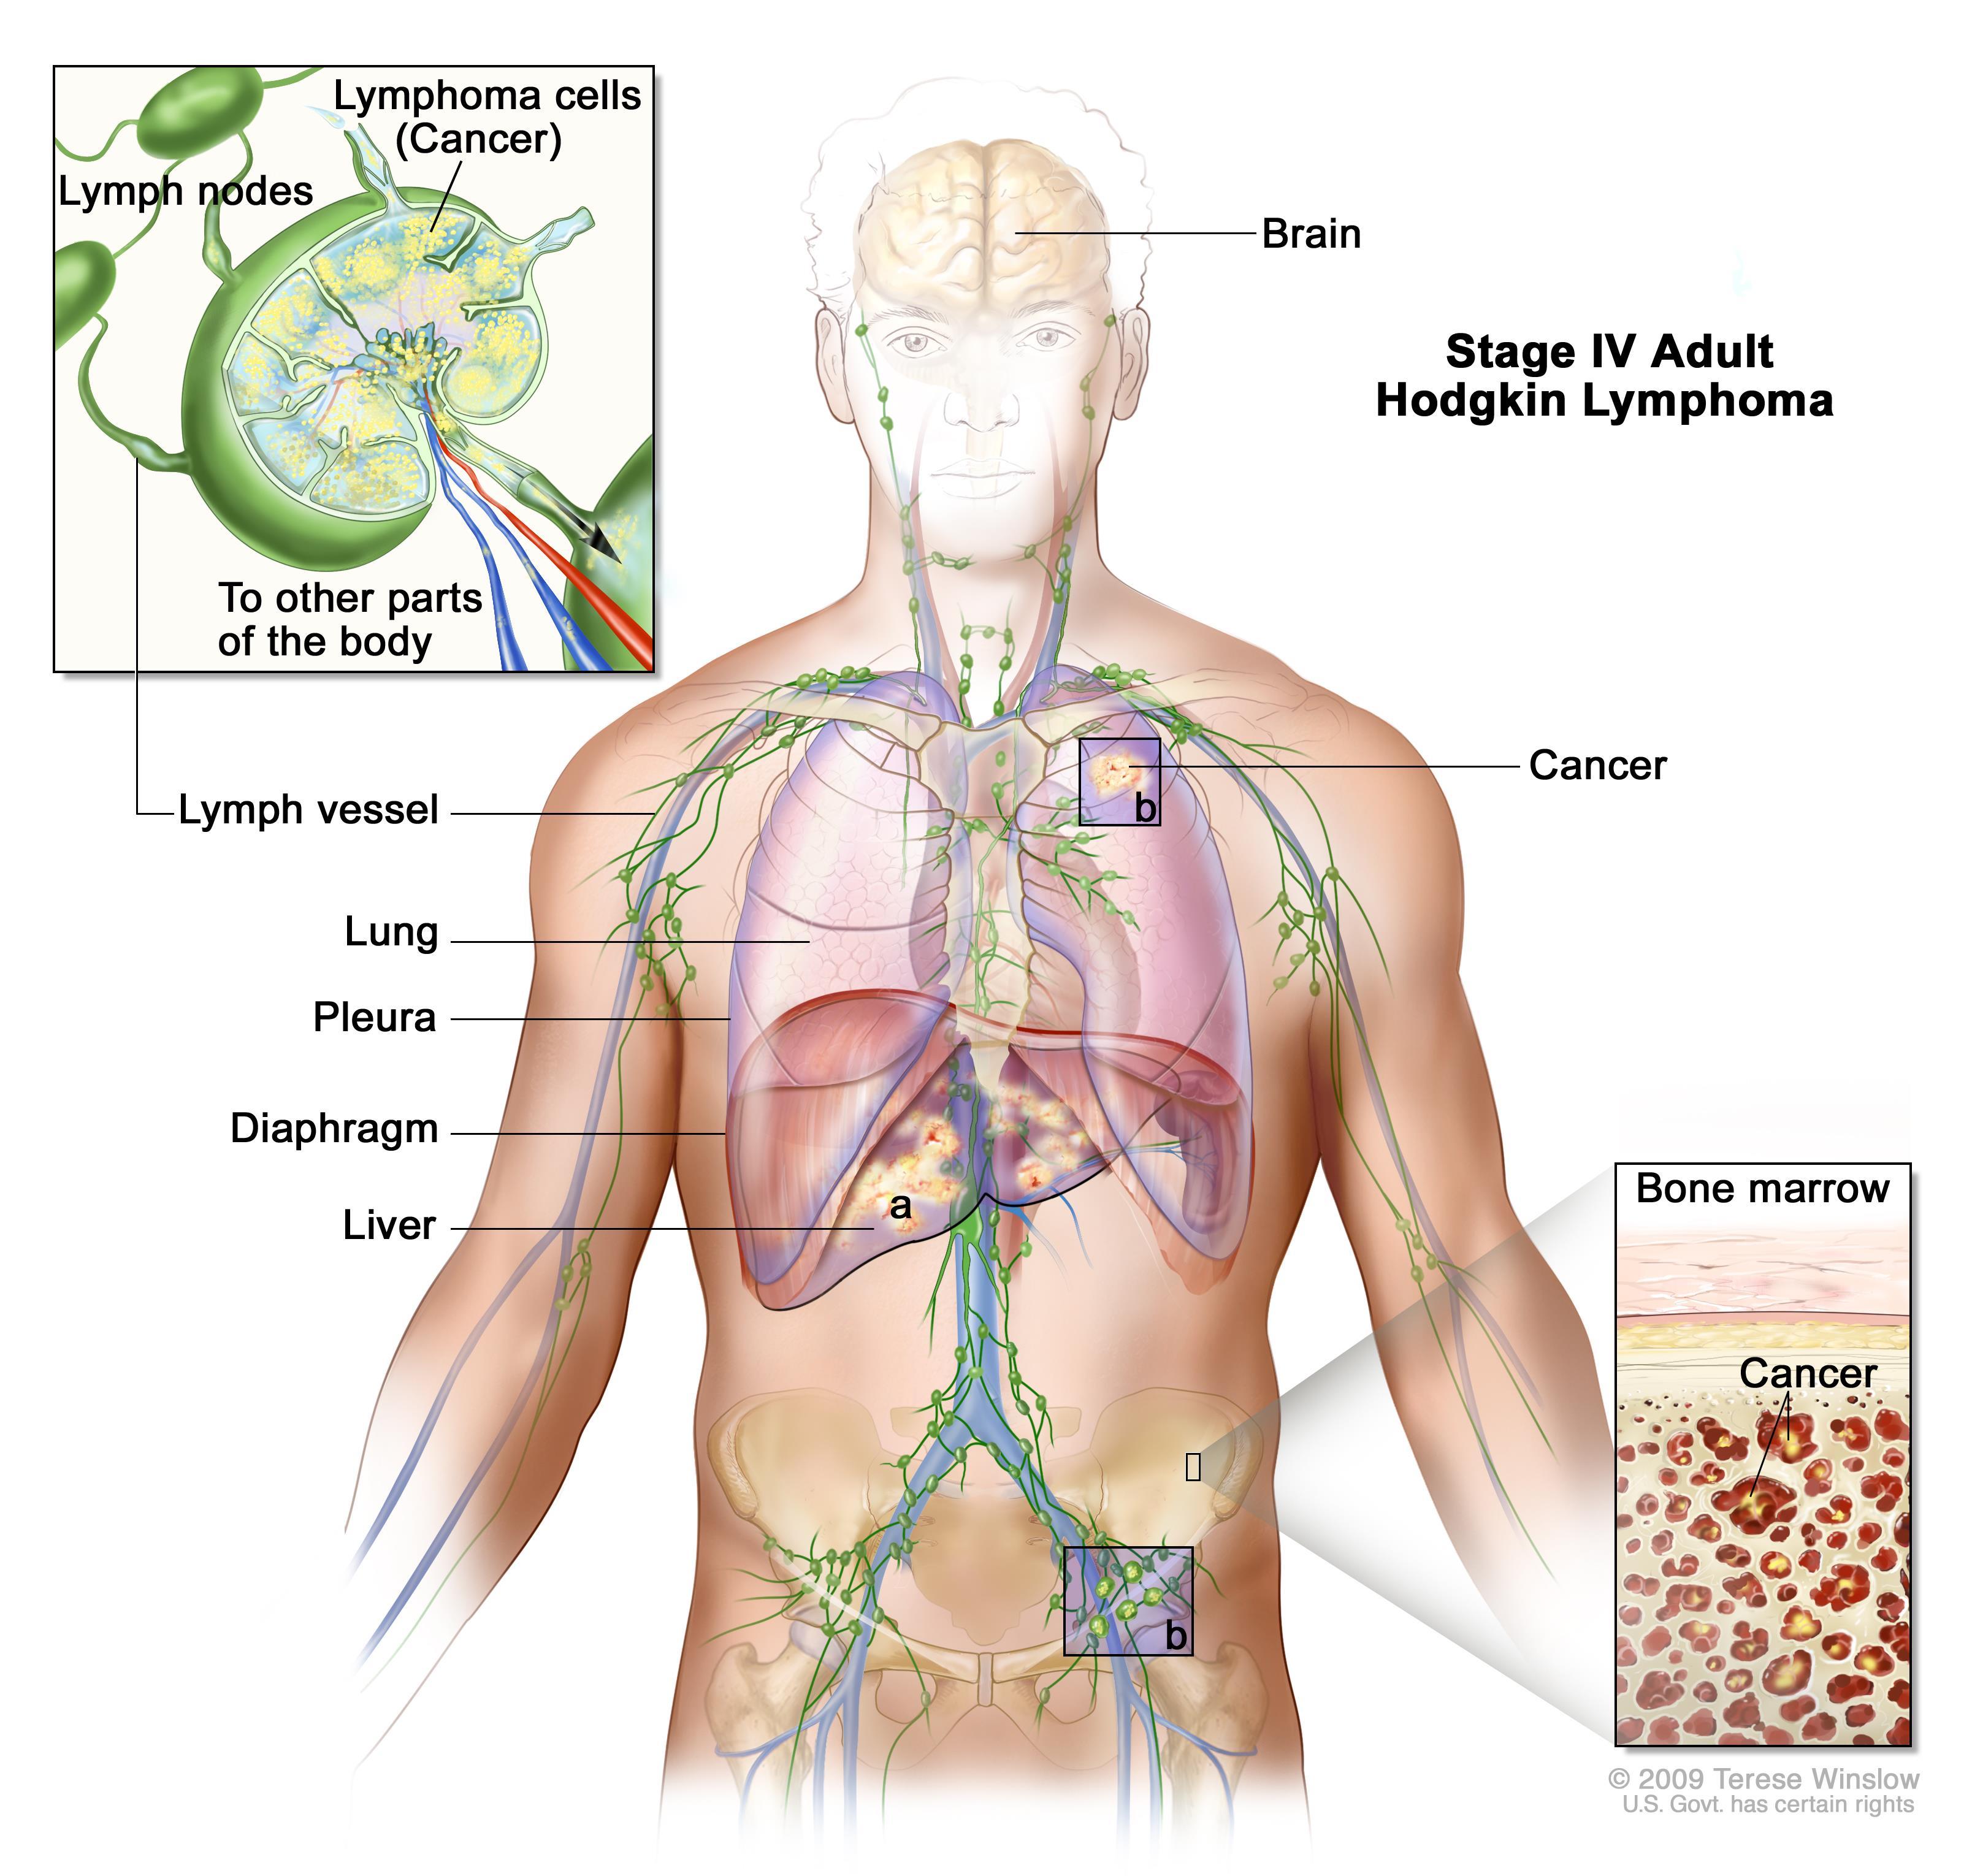 cancer hodgkin stadiu 4 jarabe contra oxiuros